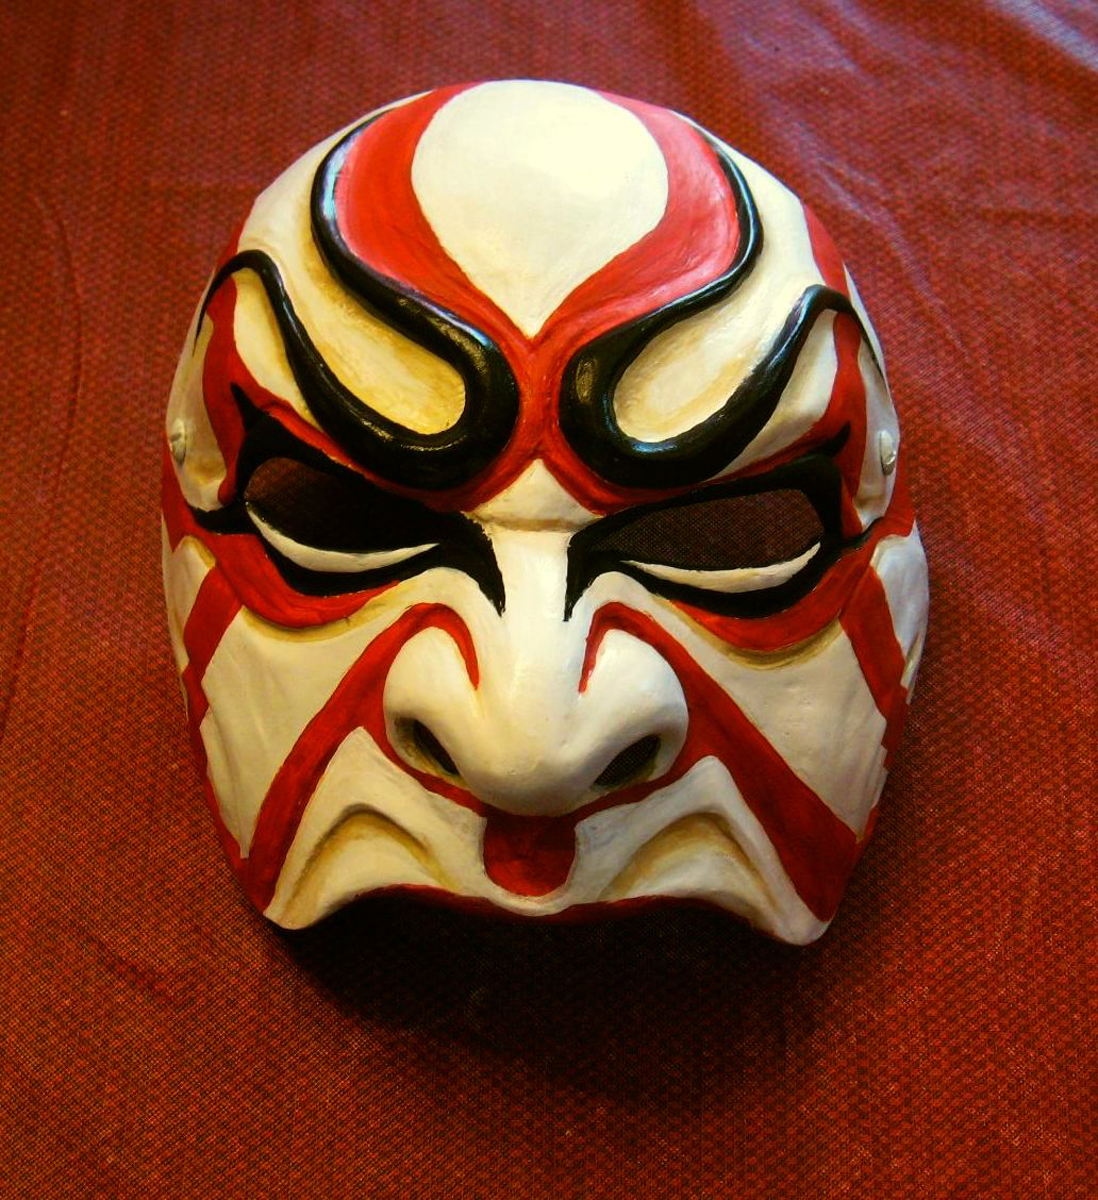 Japanese Masks on Pinterest | Samurai Warrior, Masks and ...